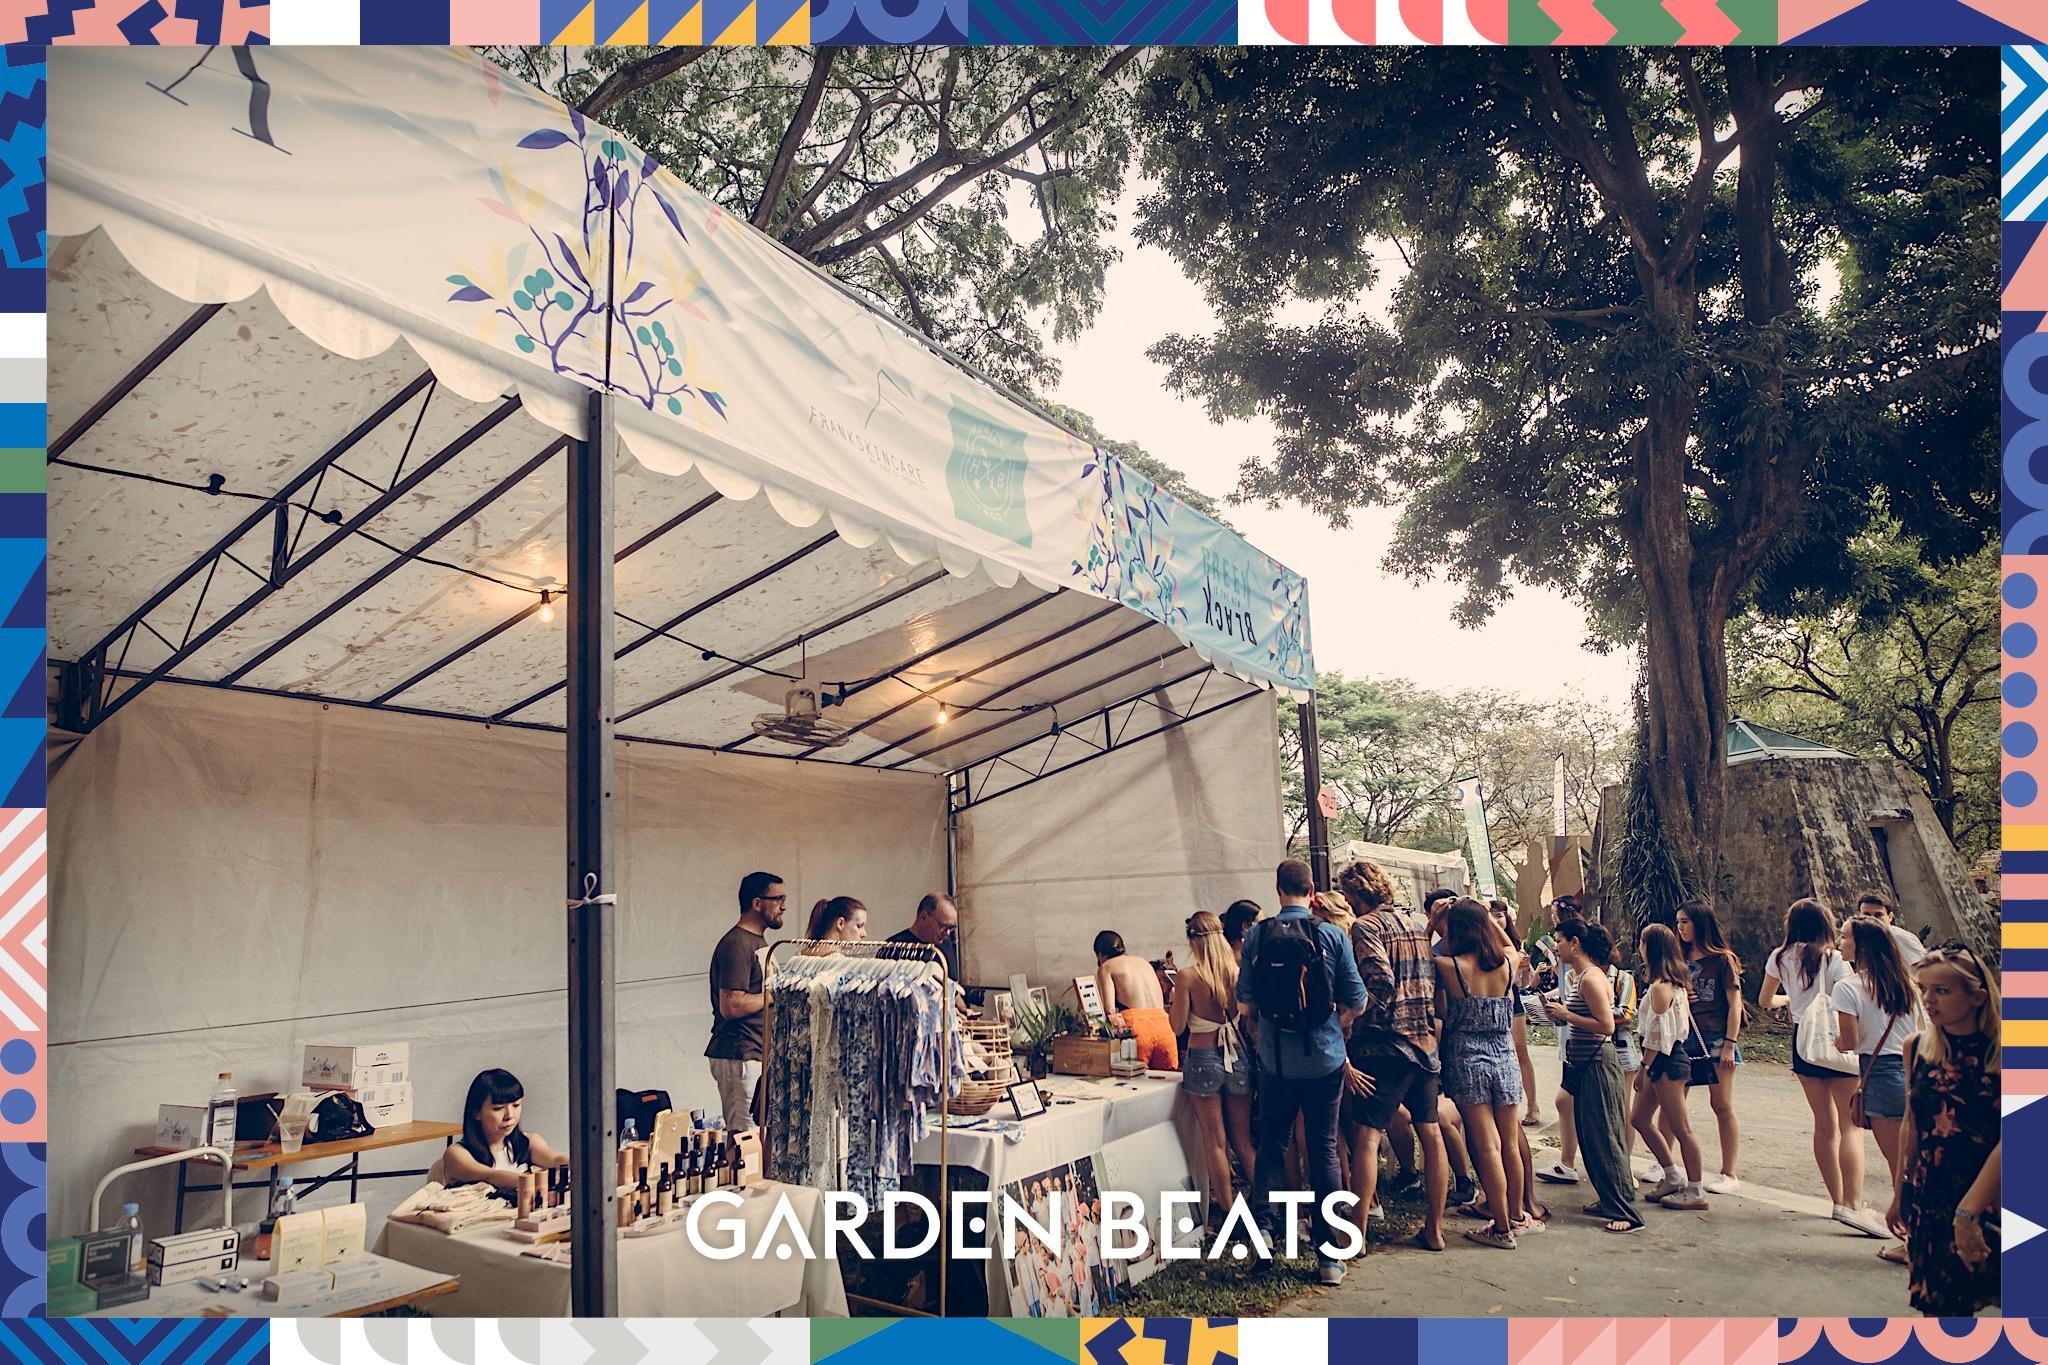 03032018_GardenBeats_Colossal350_Watermarked.jpg